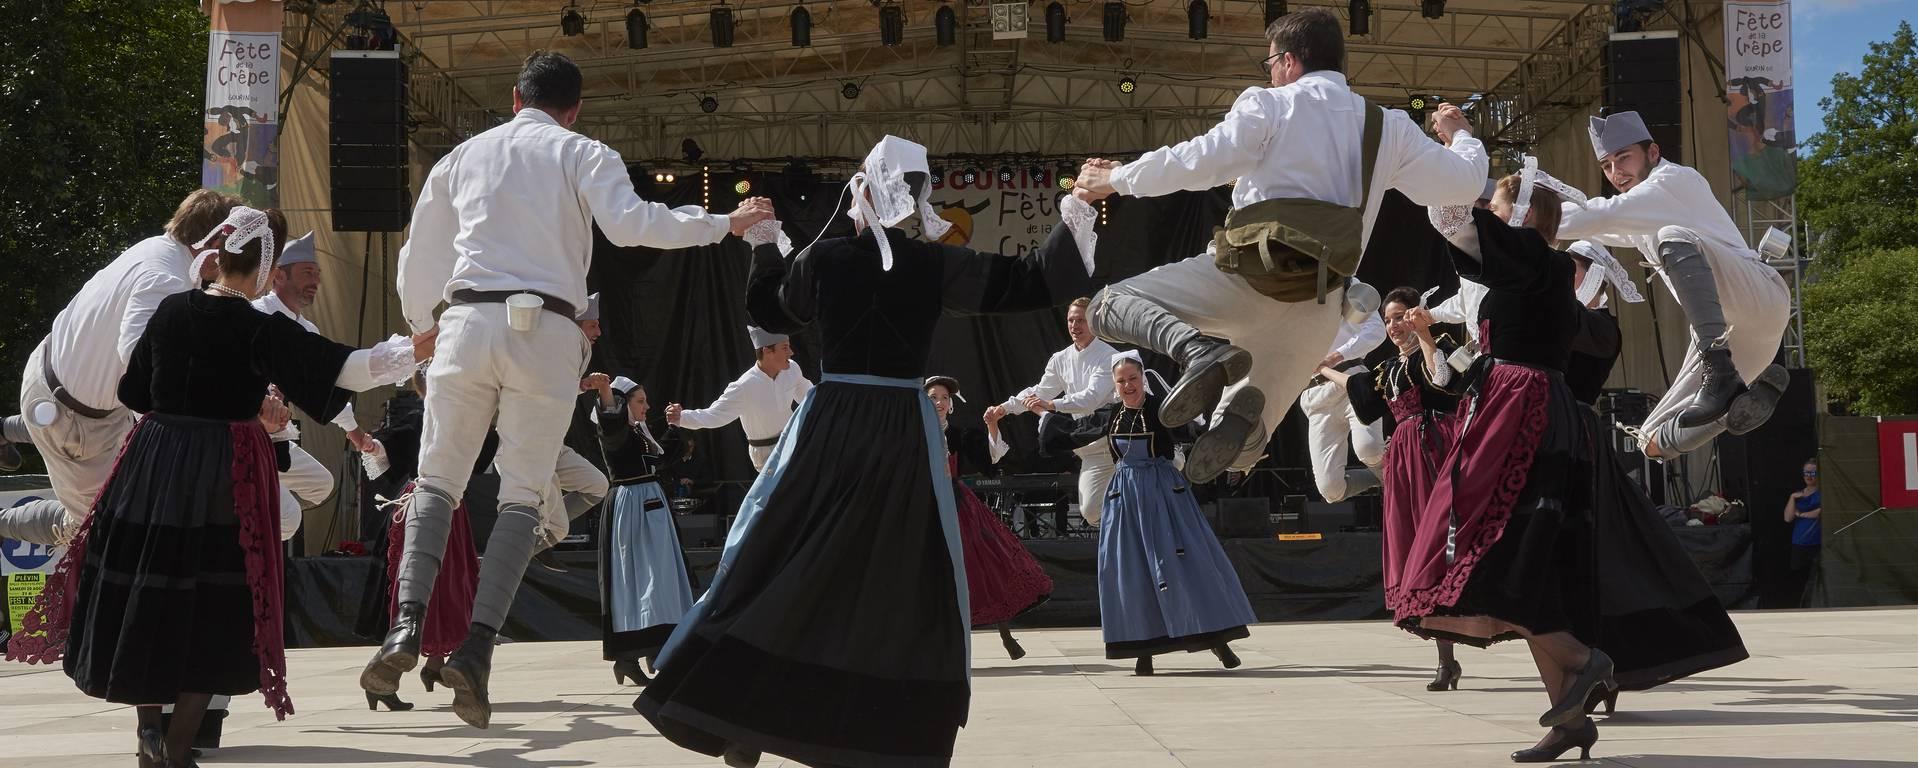 Danseurs du Croisty - © MA Gouret-Puillandre